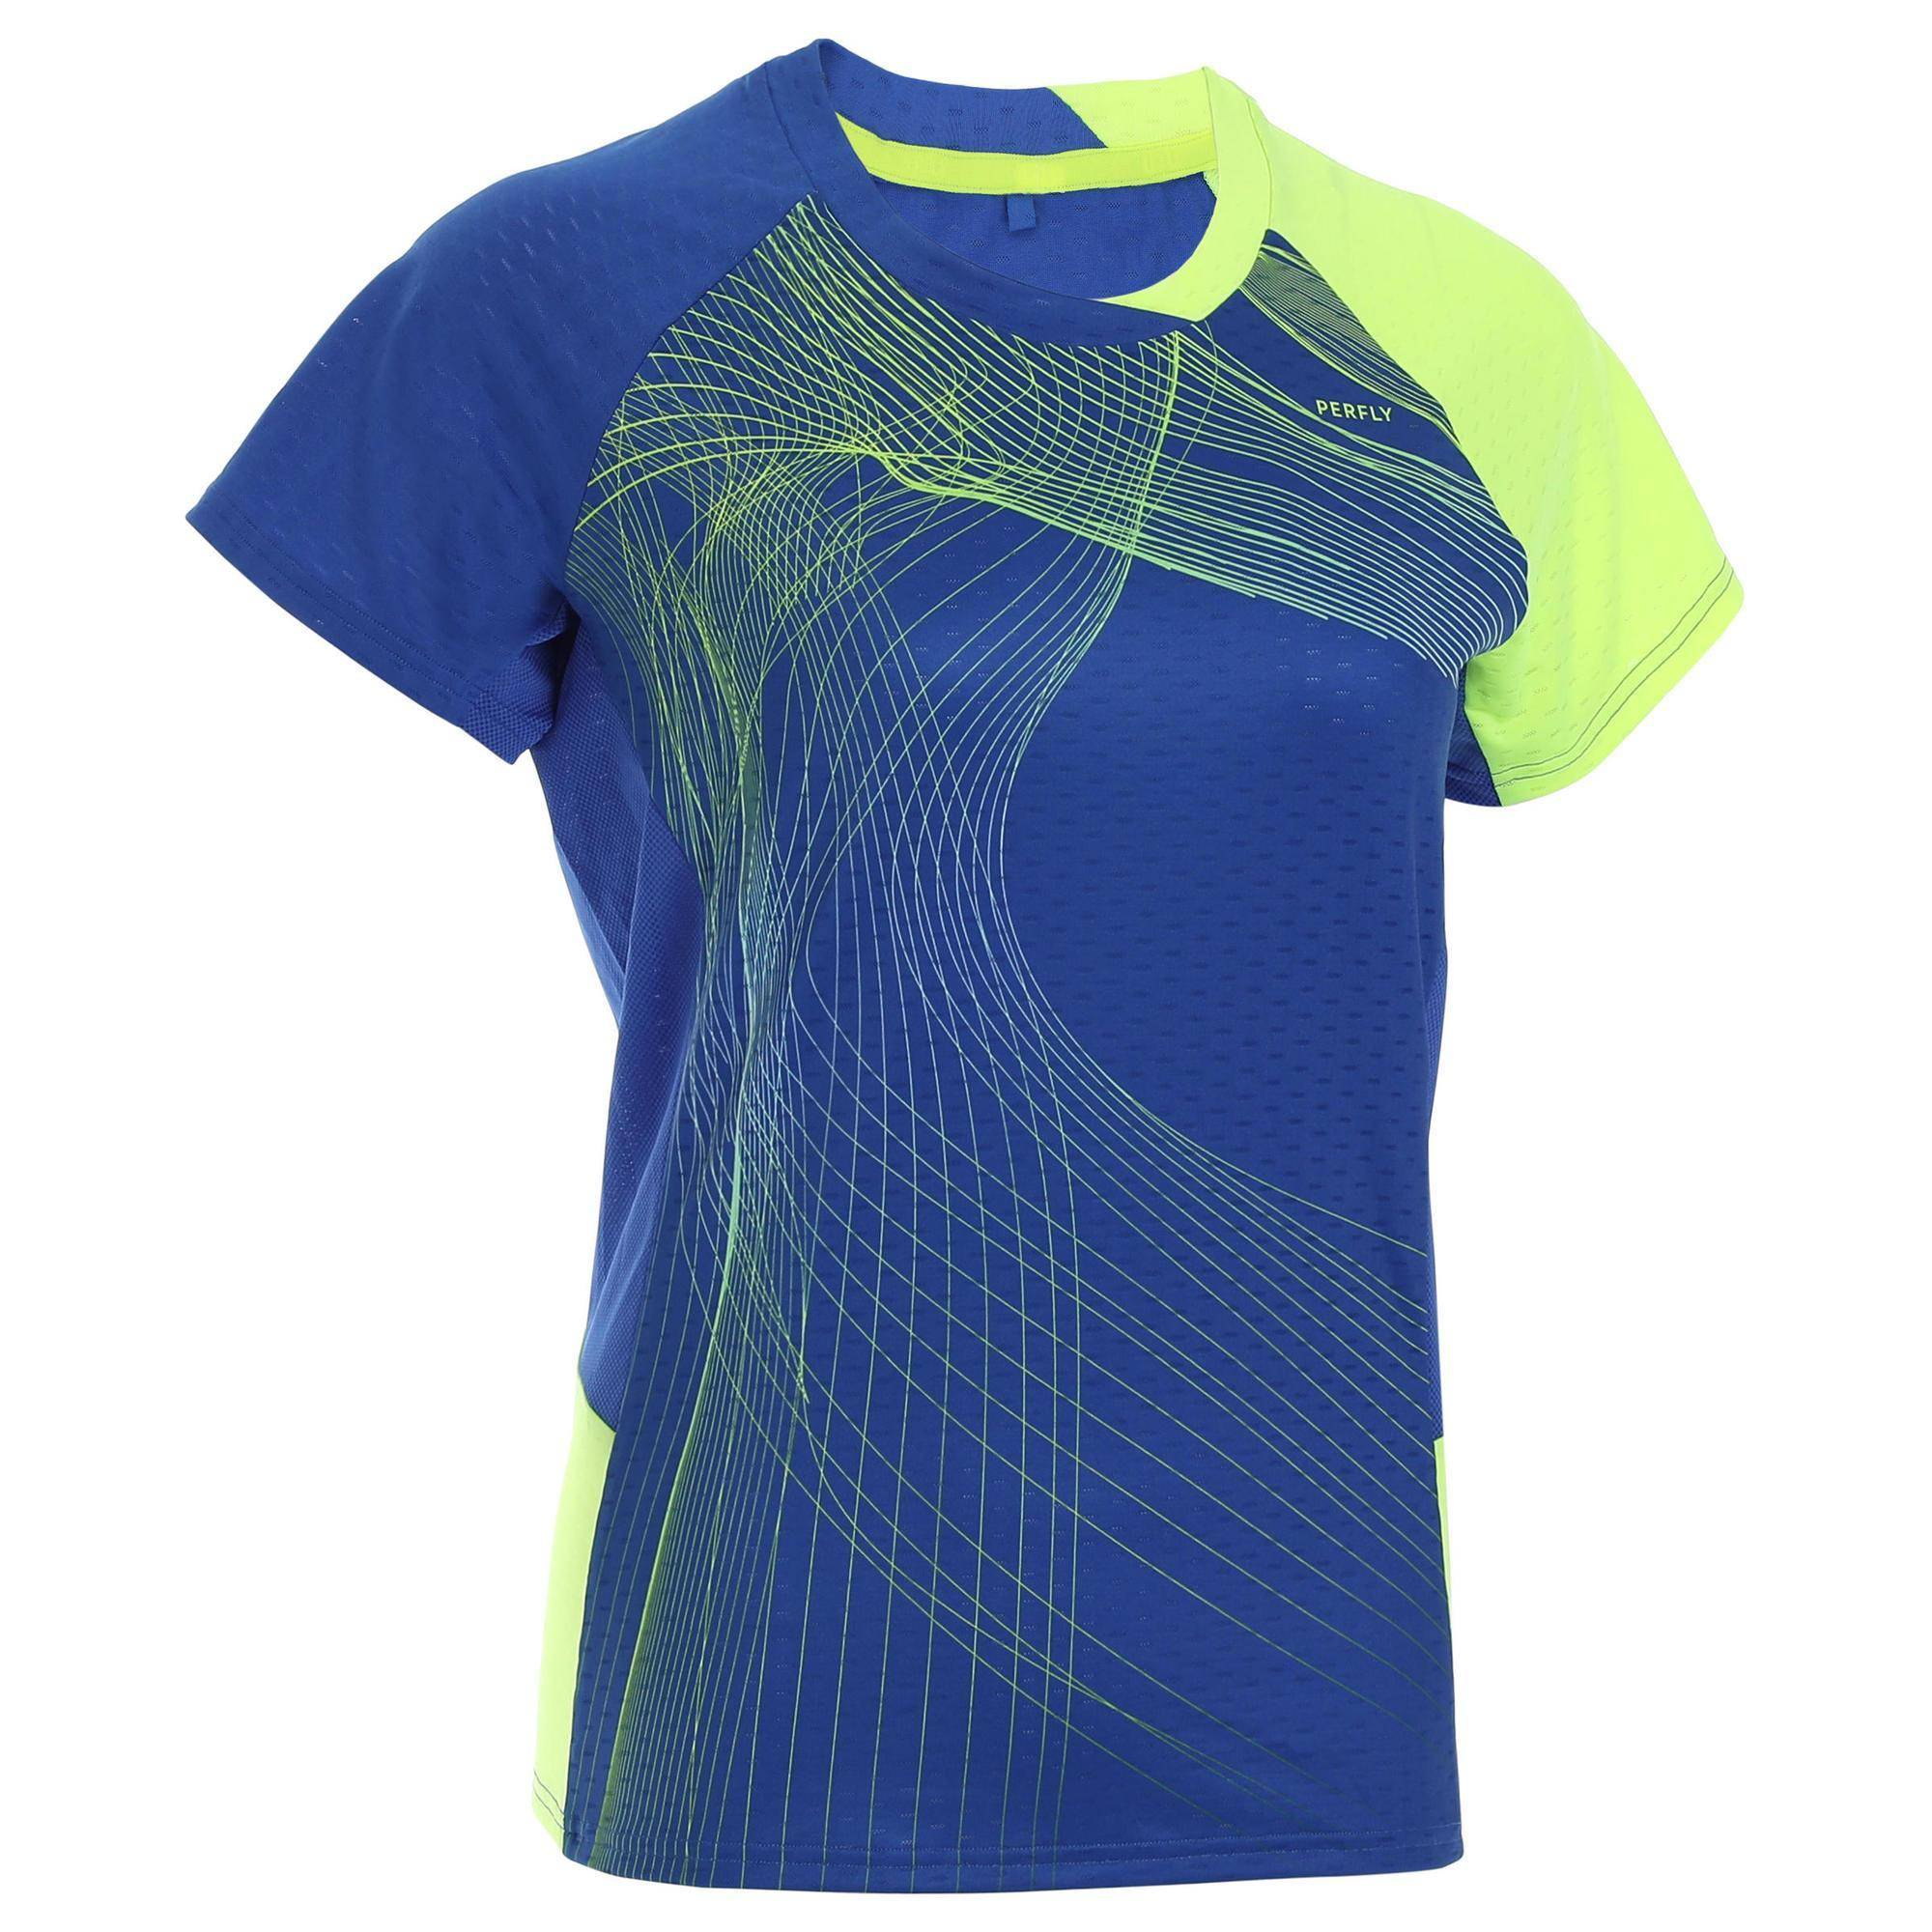 Perfly T-Shirt de badminton Femme 560 - Bleu/Jaune - Perfly